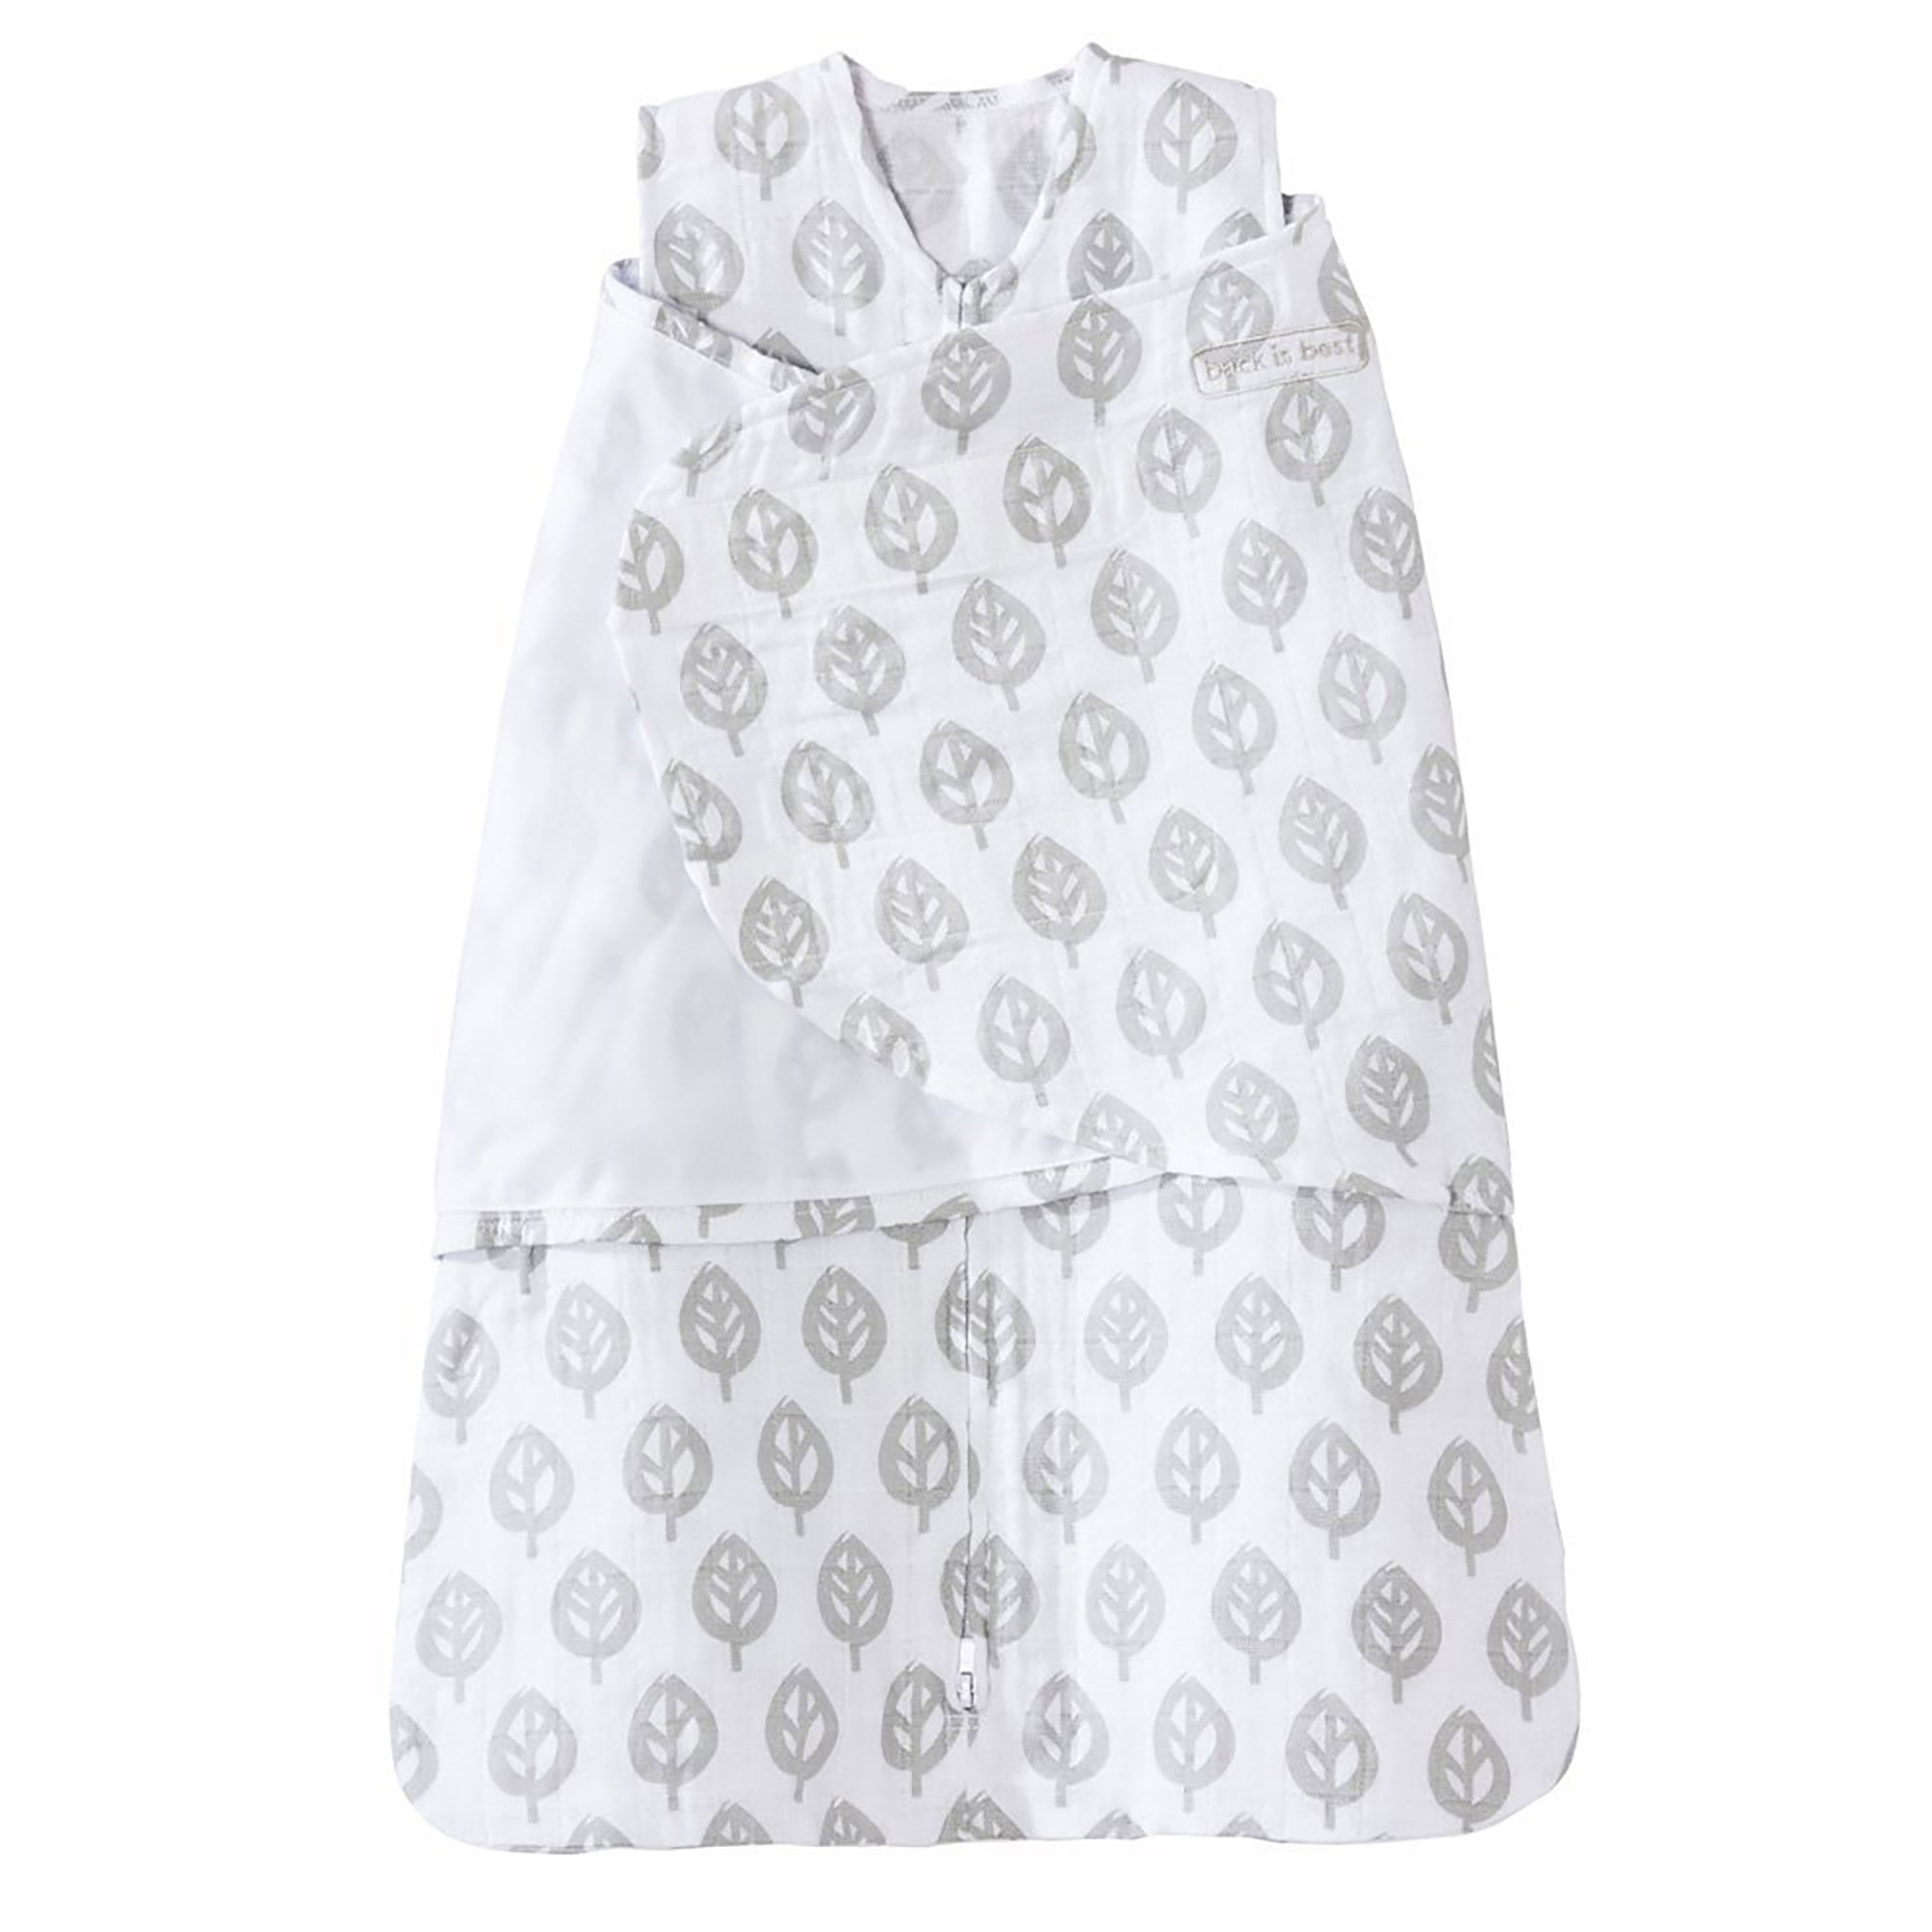 Halo 100% Cotton Muslin Baby Sleepsack Swaddle Wearable Blanket, Grey Tree Leaf, SM